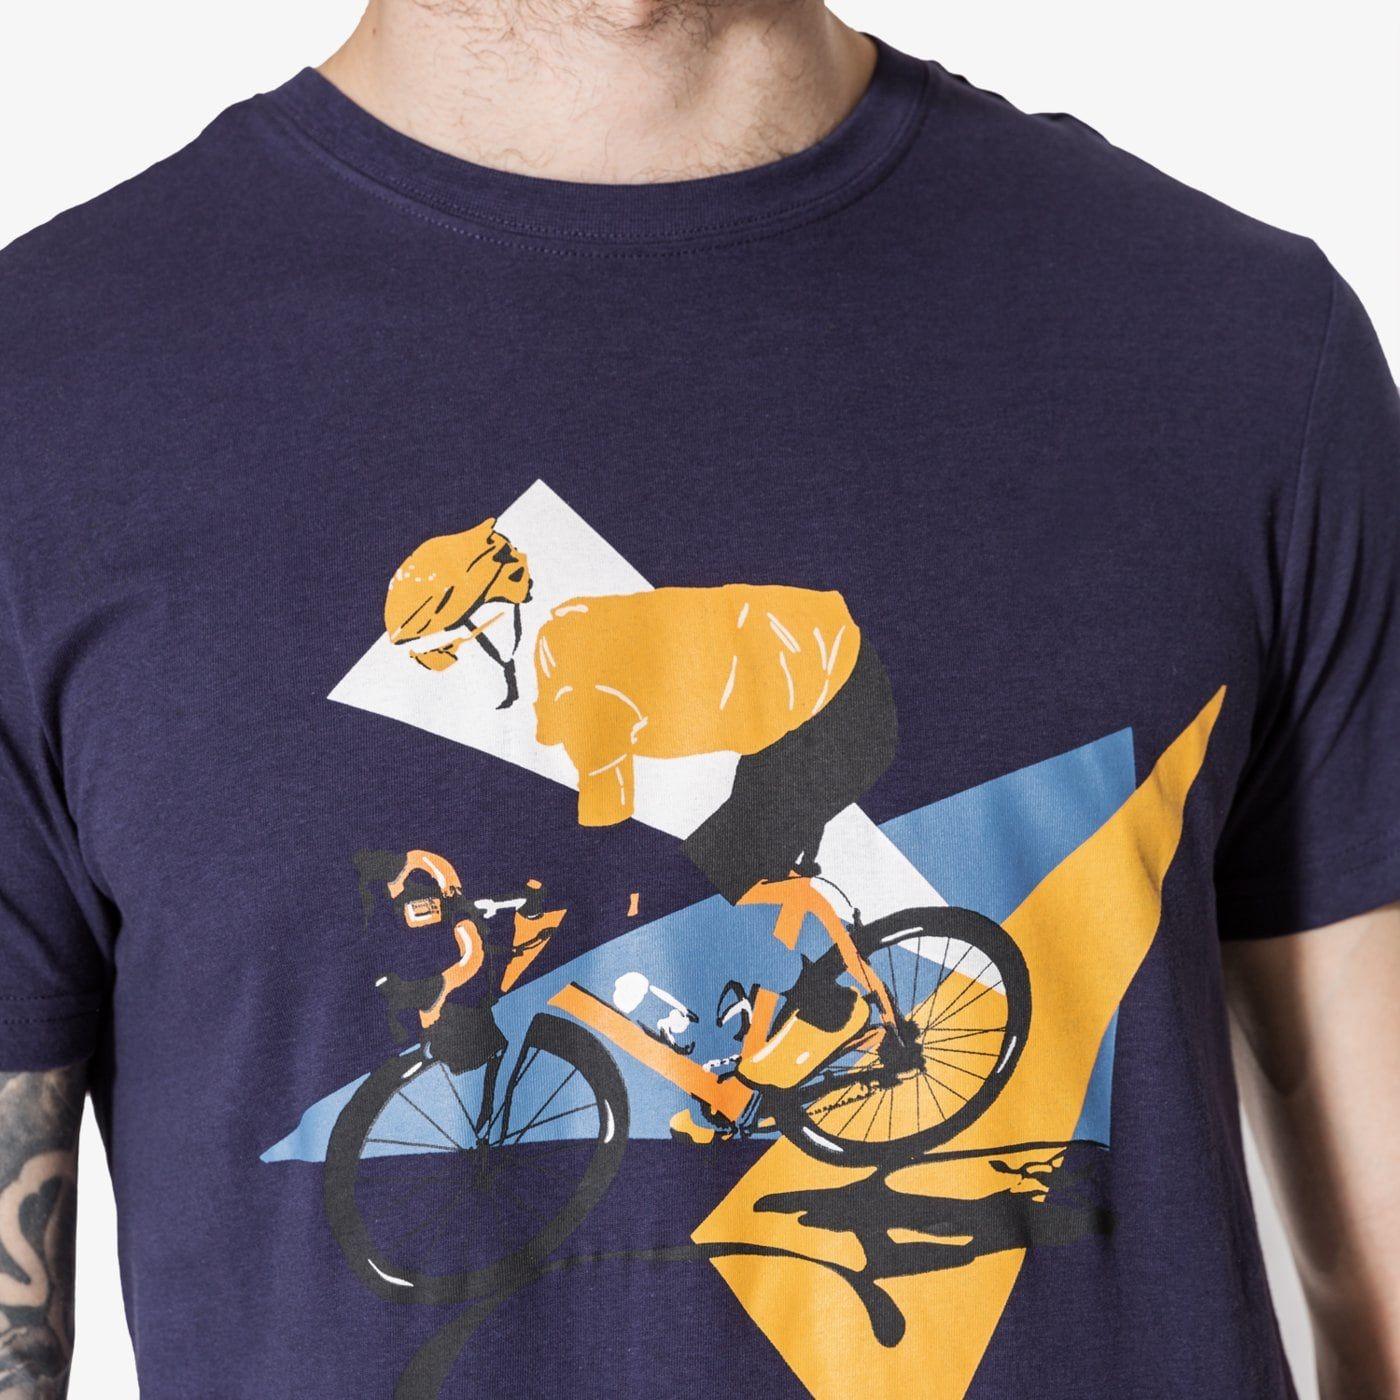 Koszulki confront z Sizzer